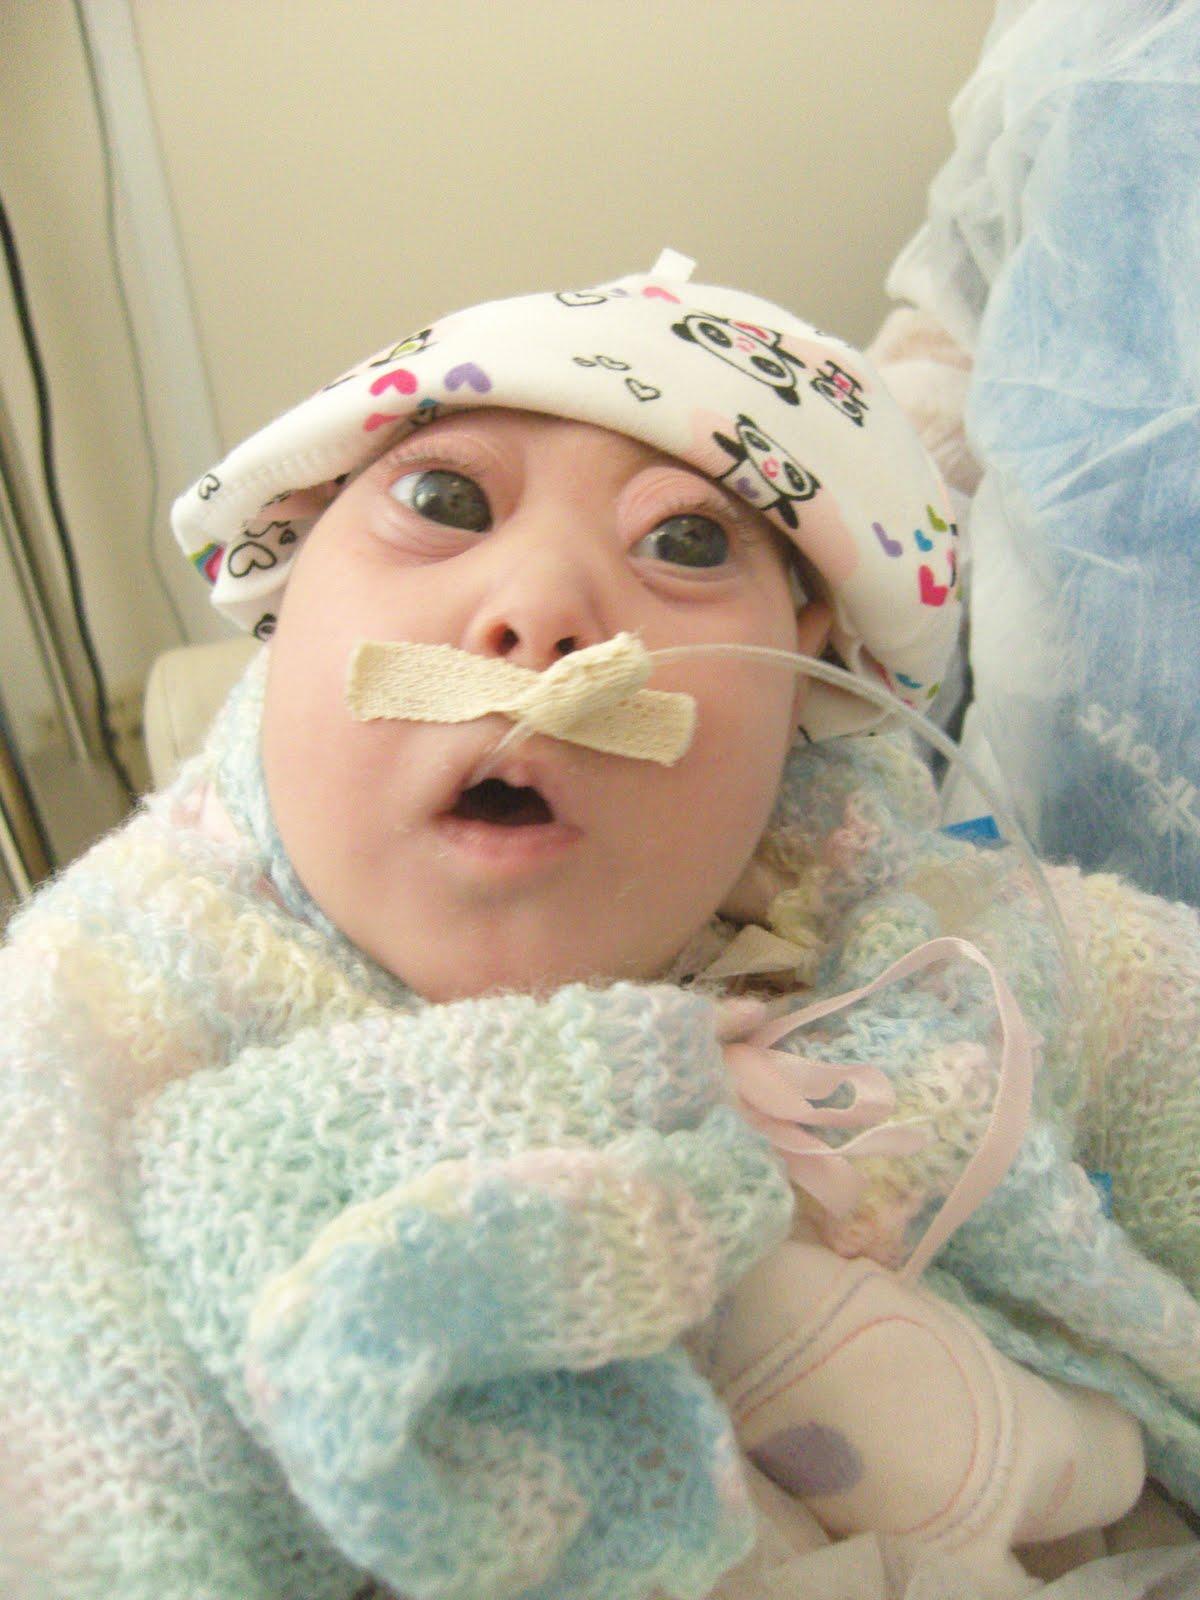 The story of baby Faith Hope: Our journey so far...